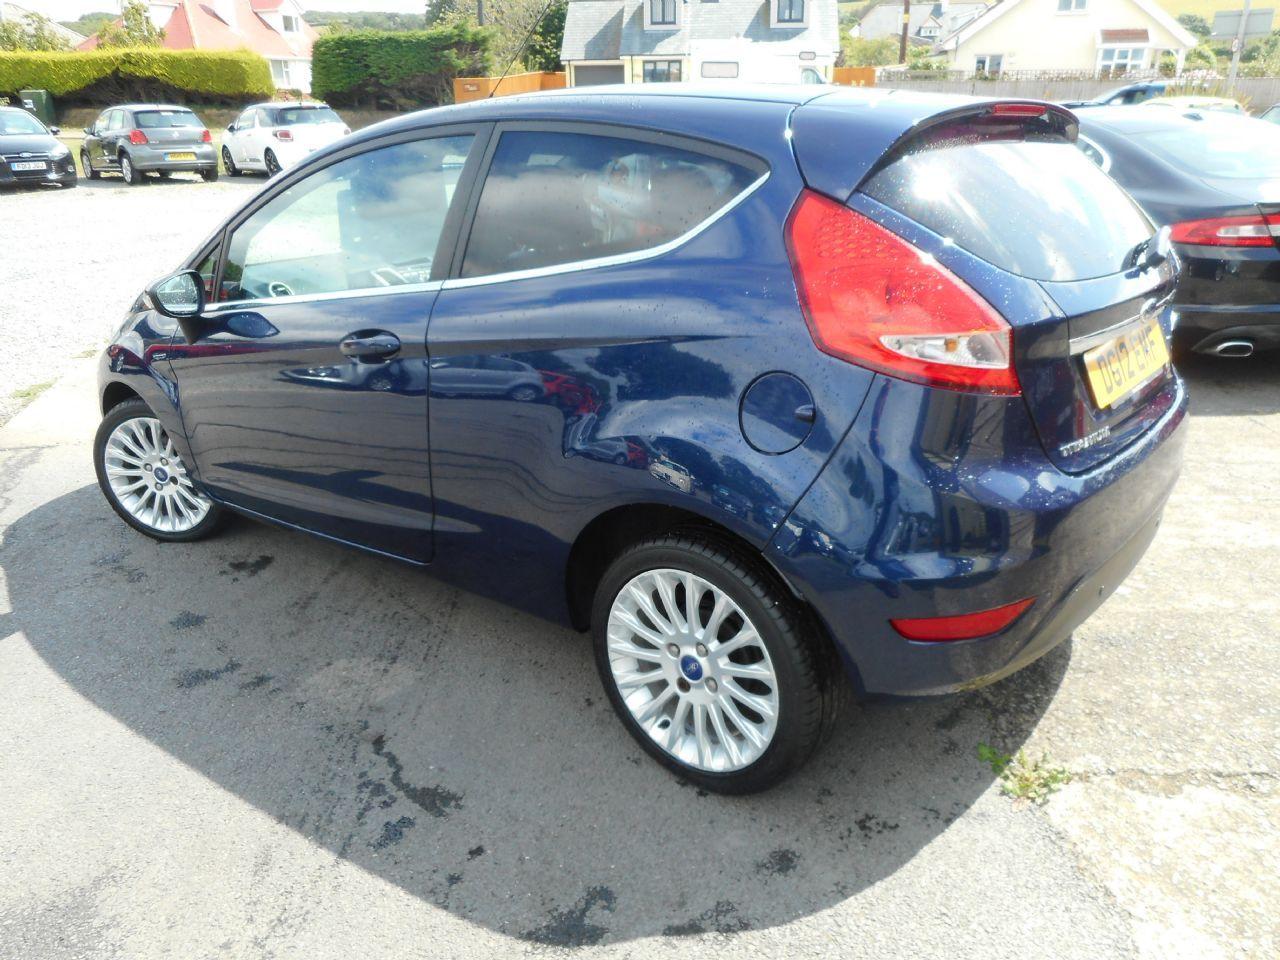 FORD Fiesta Titanium 1.4 096 Auto (2012) - Picture 8